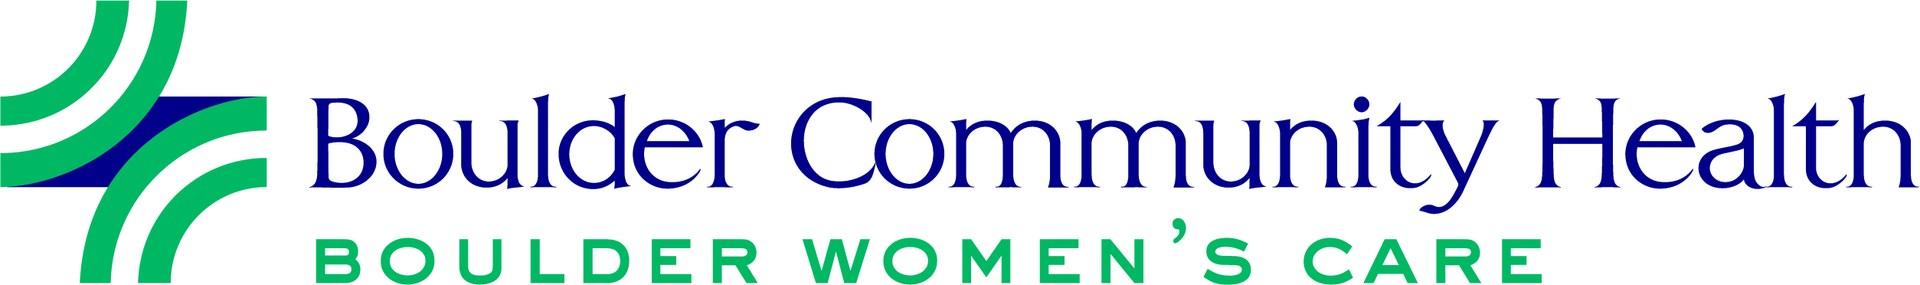 Boulder Community Health - Boulder Women's Care Logo